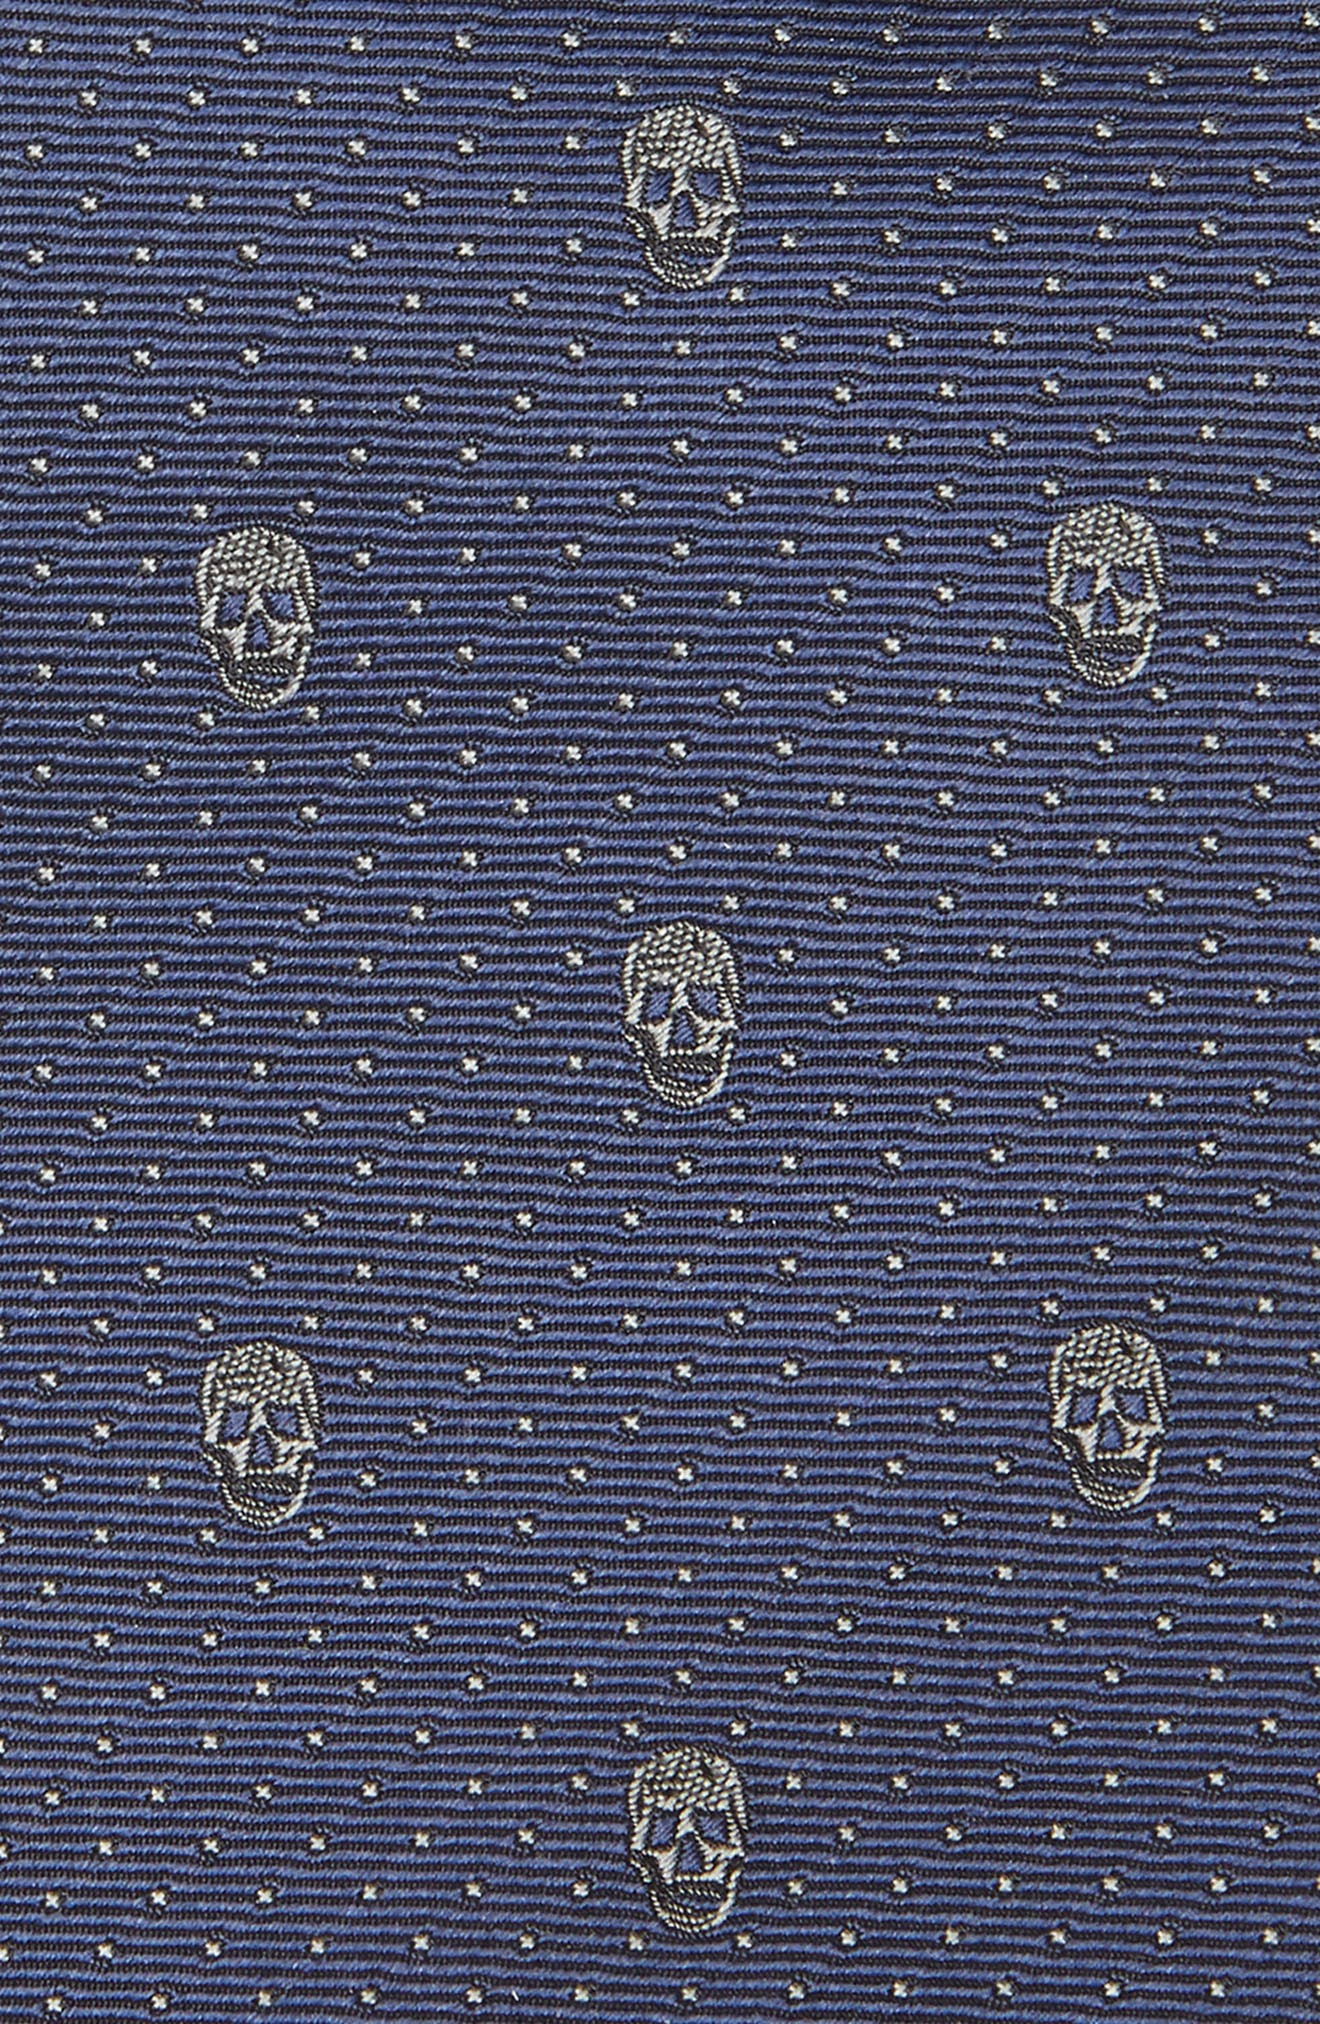 Skull Silk Tie,                             Alternate thumbnail 2, color,                             MIDNIGHT BLUE AND GREY